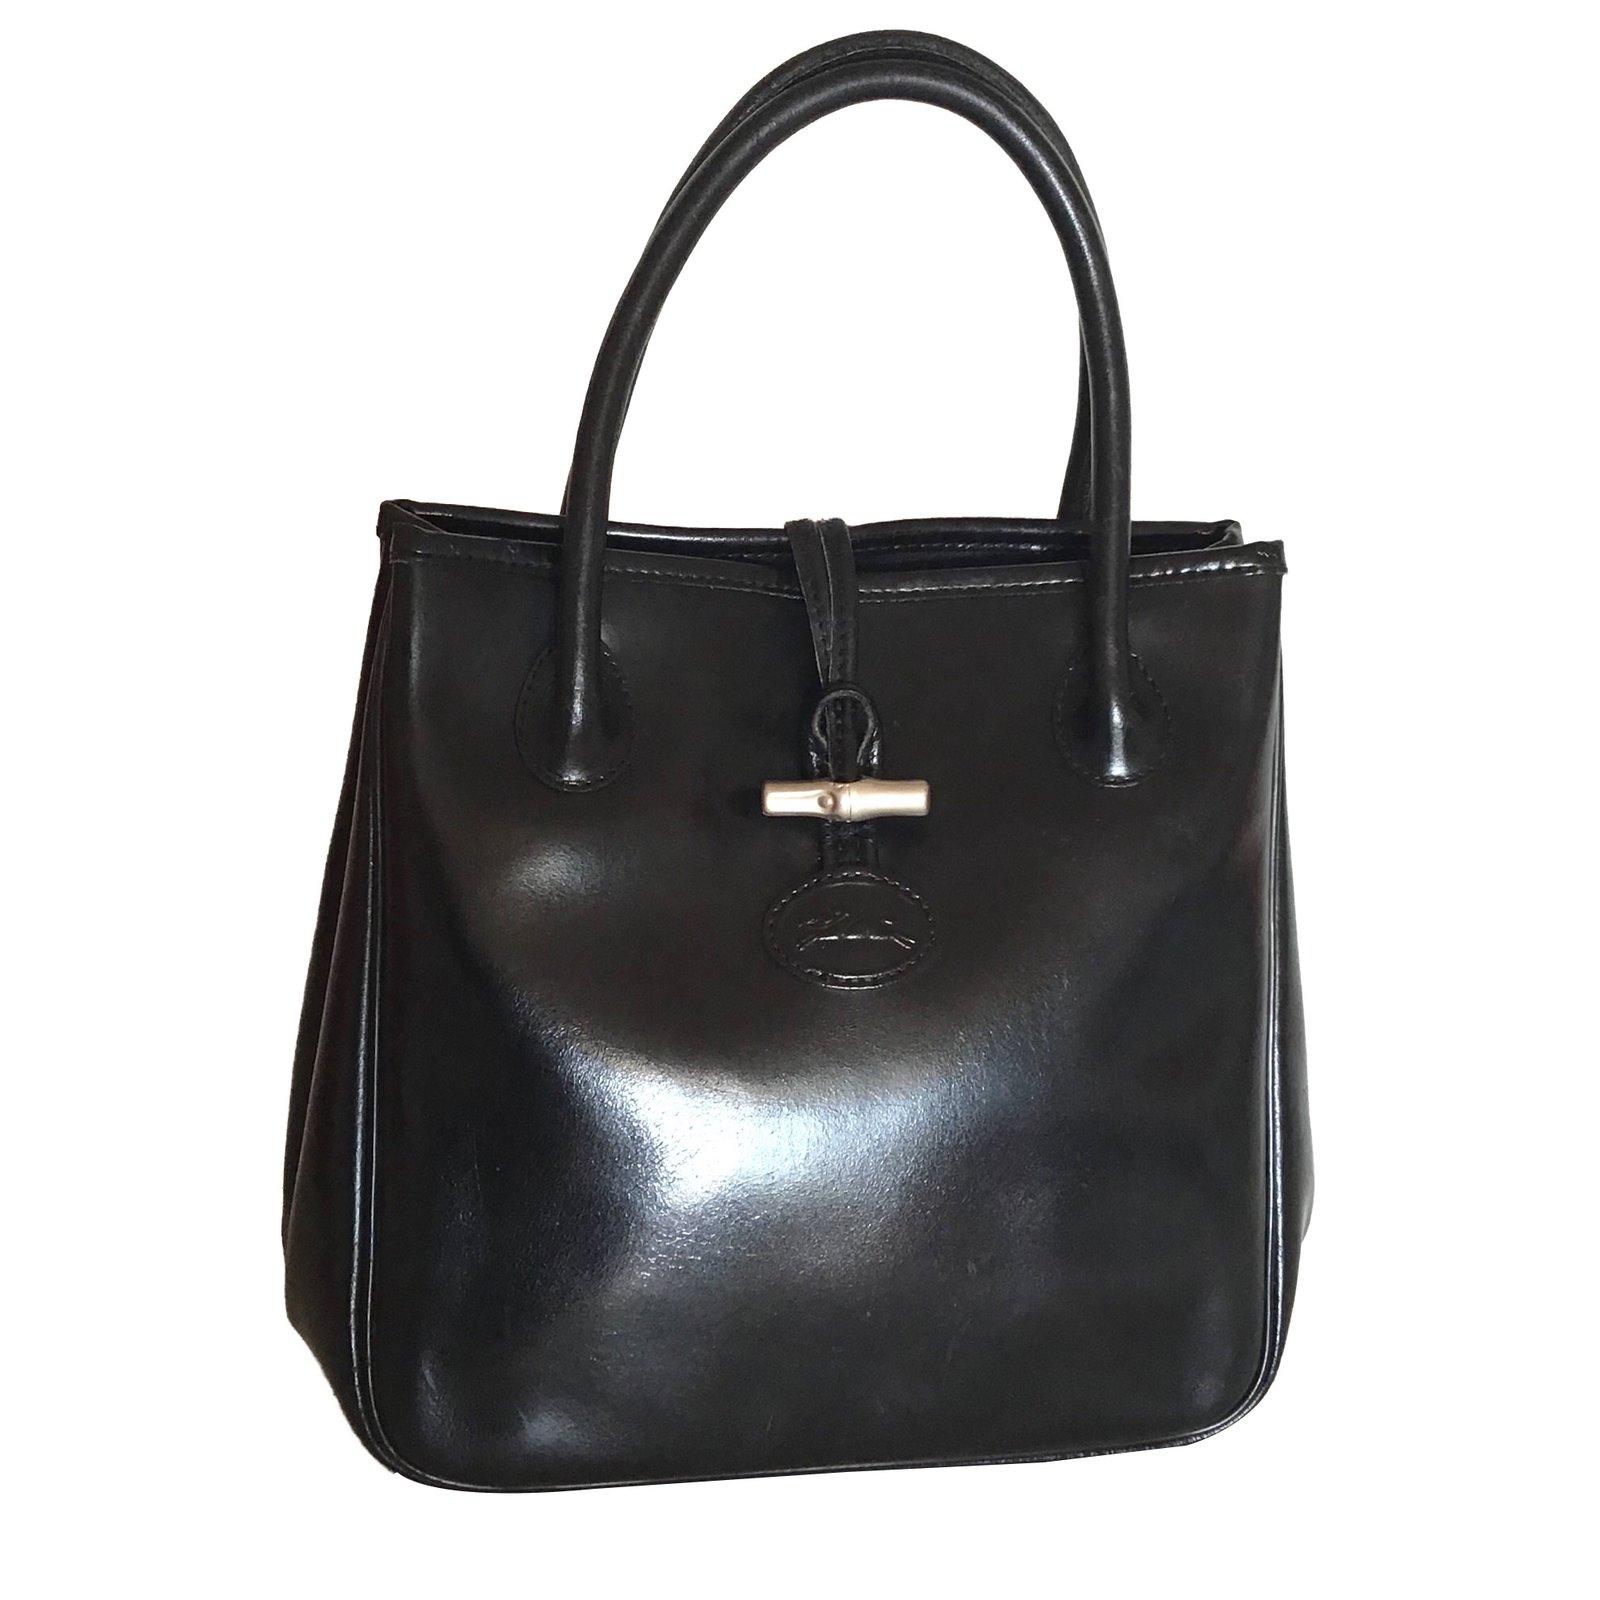 in Black Mano At Borse Nice Ref pelle W4wqwpsn7 Longchamp Closet 84689 Borsa BzRqwdq